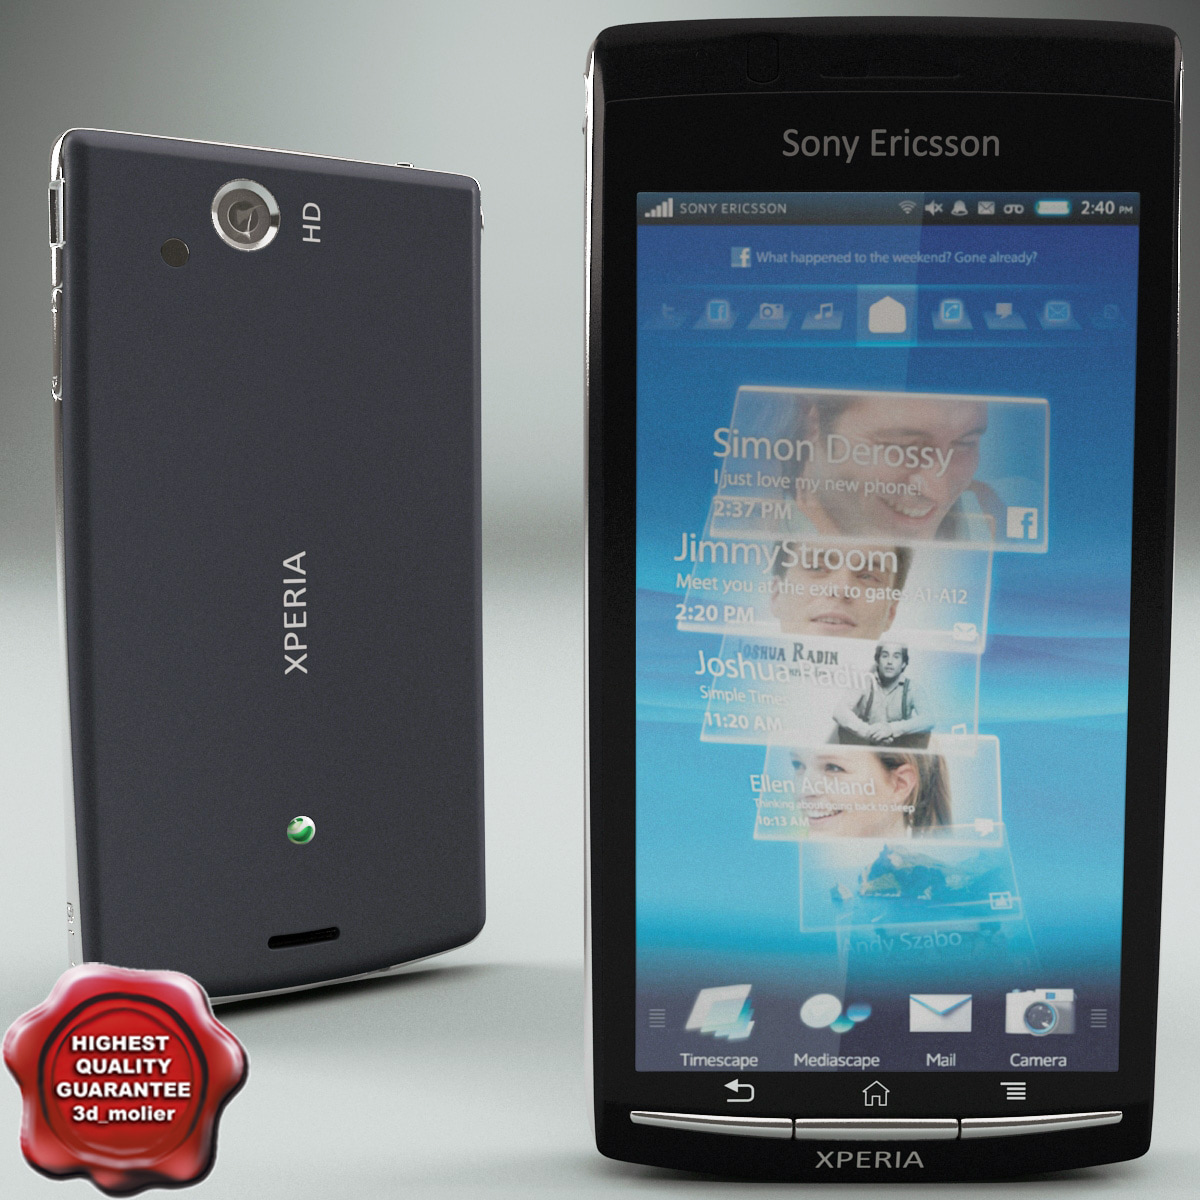 Sony_Ericsson_Xperia_Arc_00.jpg